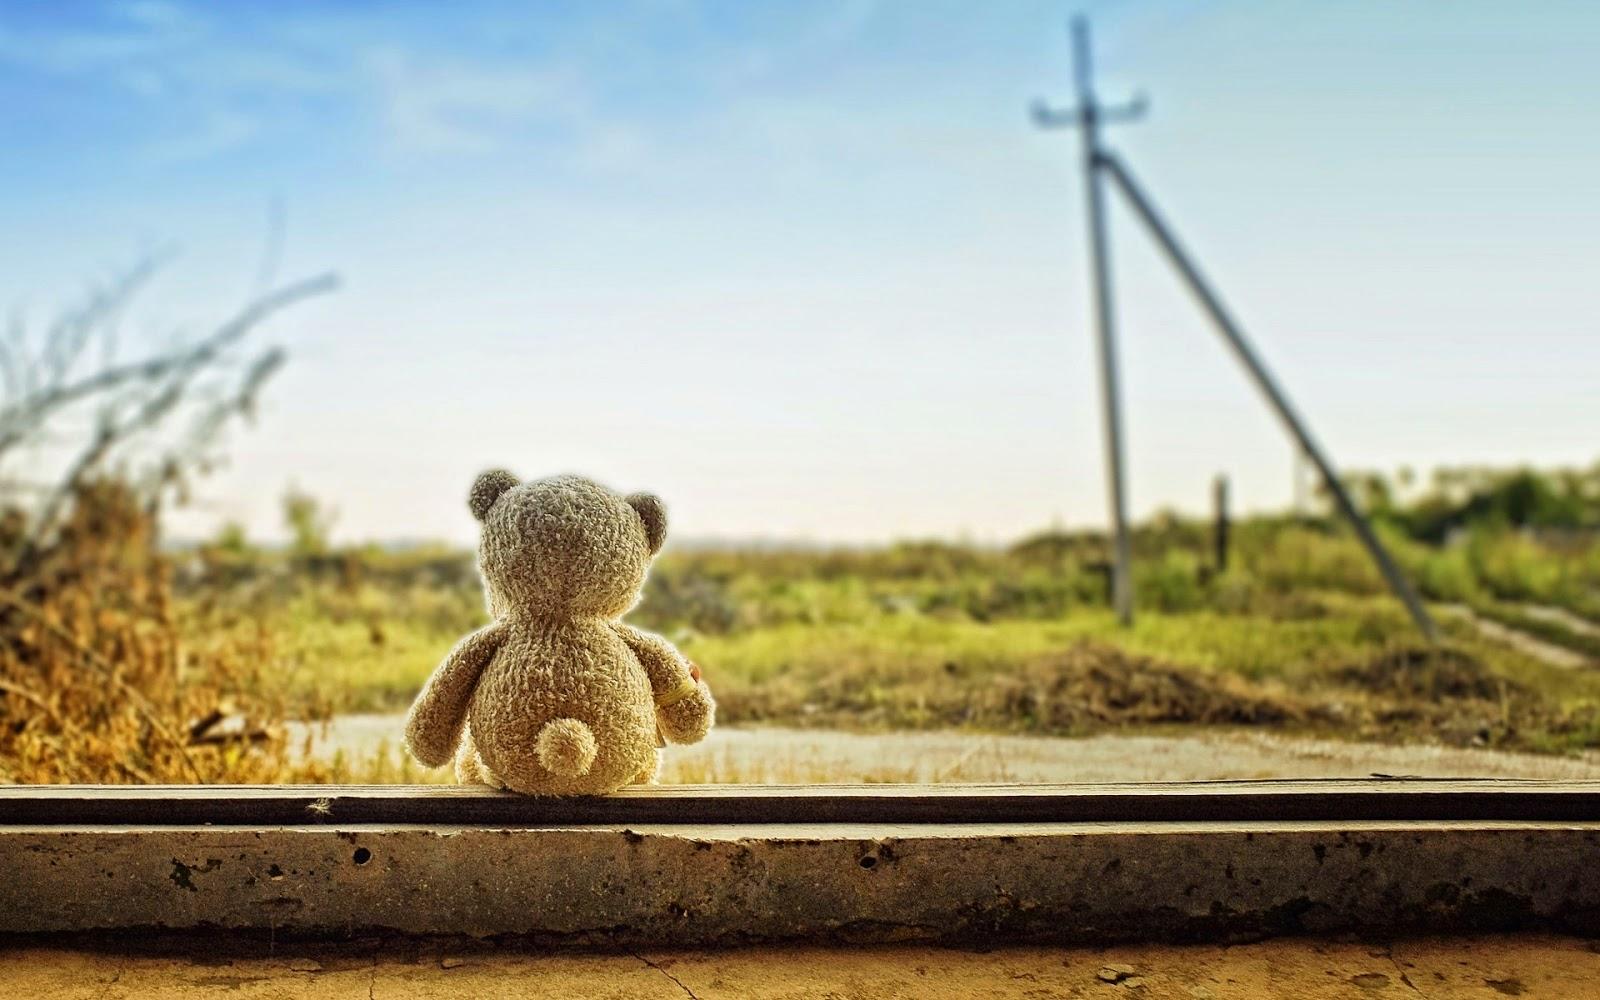 Teddy-bear-left-alone-feeling-lonely-sad-image-HD.jpg